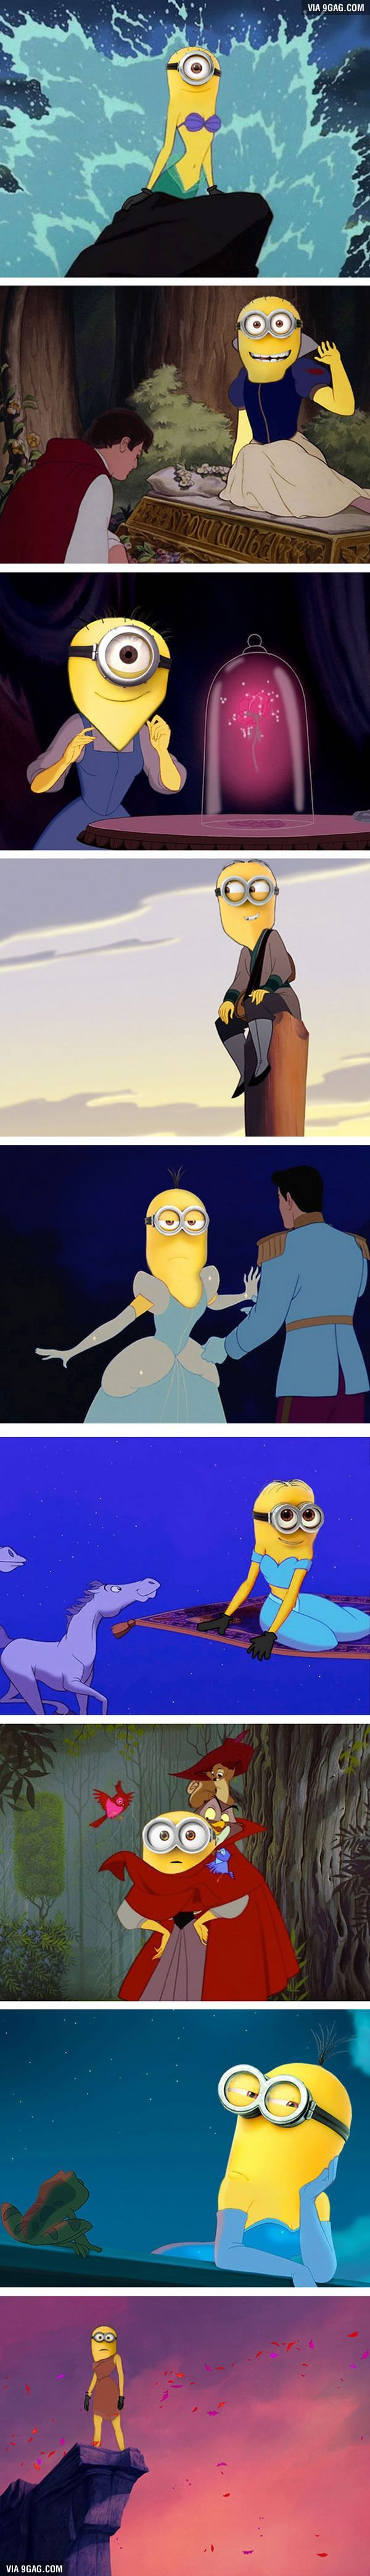 "What If Disney Princesses Were ""Minions""?"